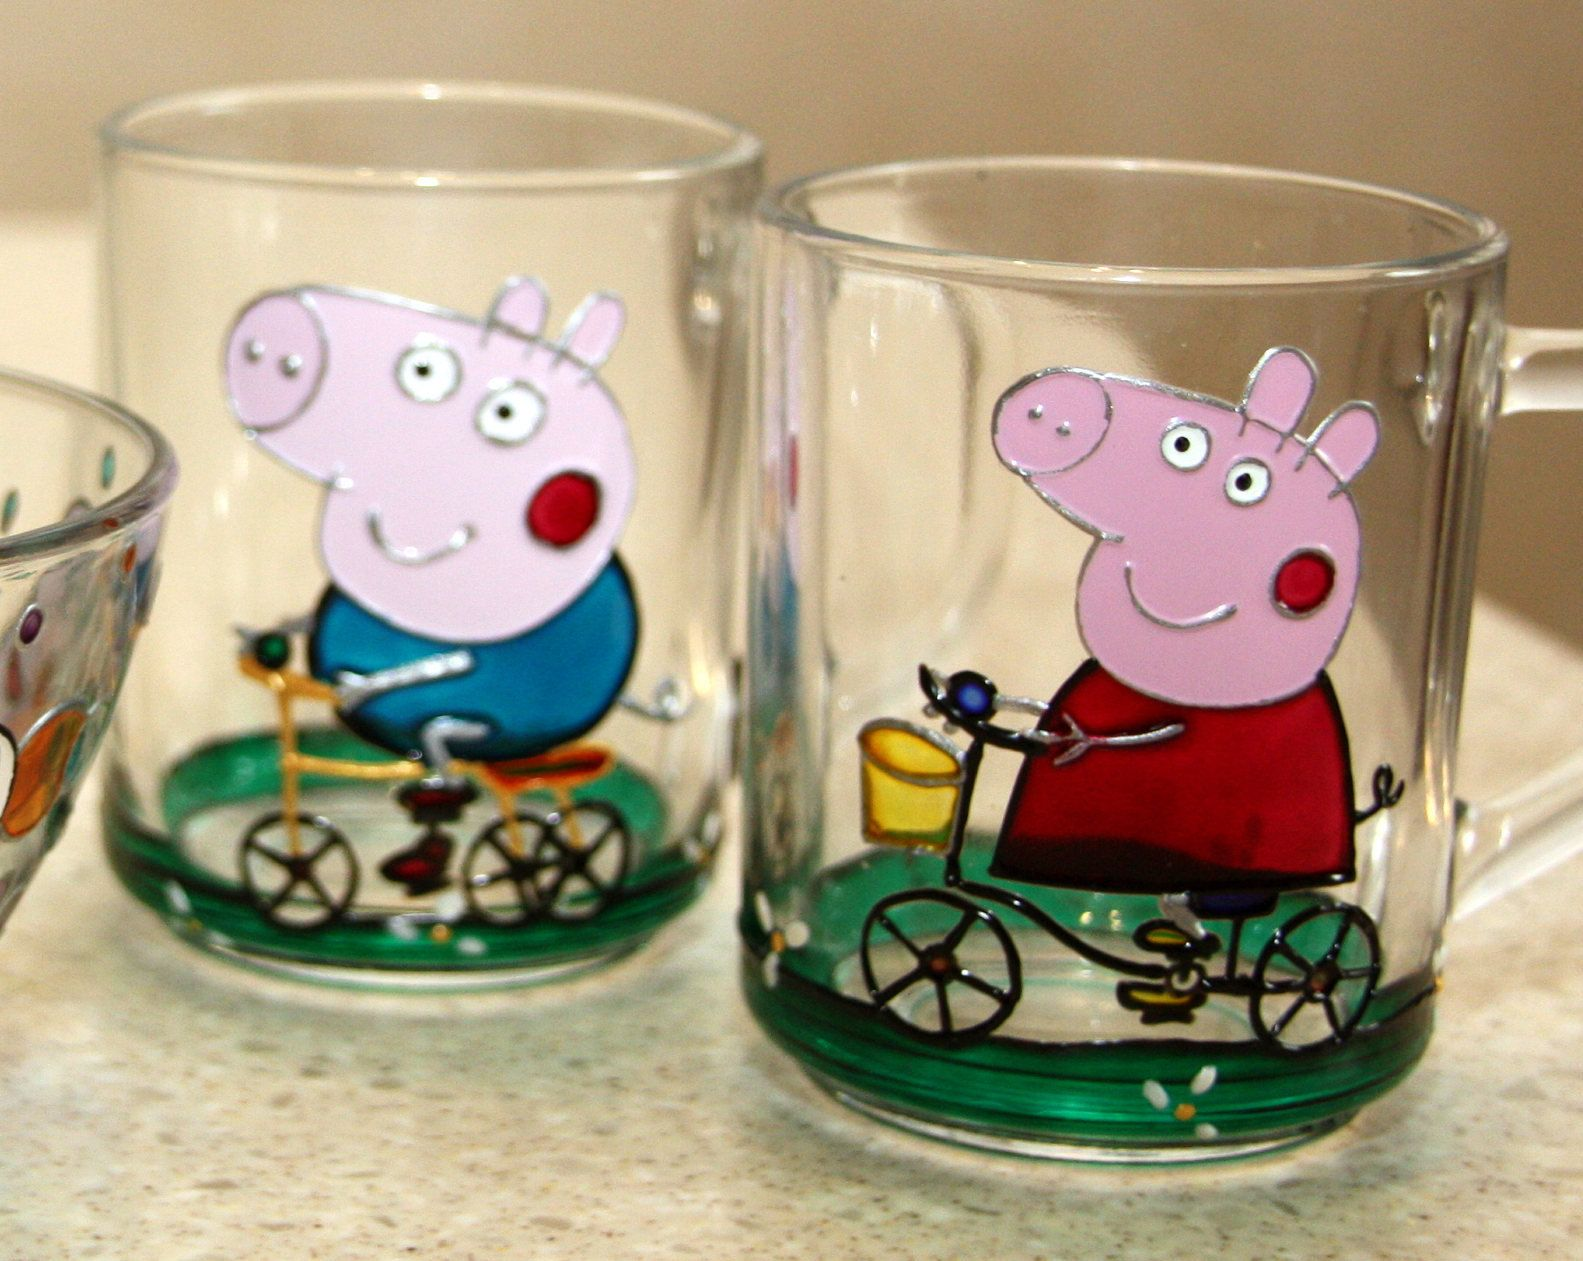 Personalized Peppa Pig mug-Hand painted kids cup-Personalized kids tableware set-Mug & Personalized Peppa Pig mug-Hand painted kids cup-Personalized kids ...